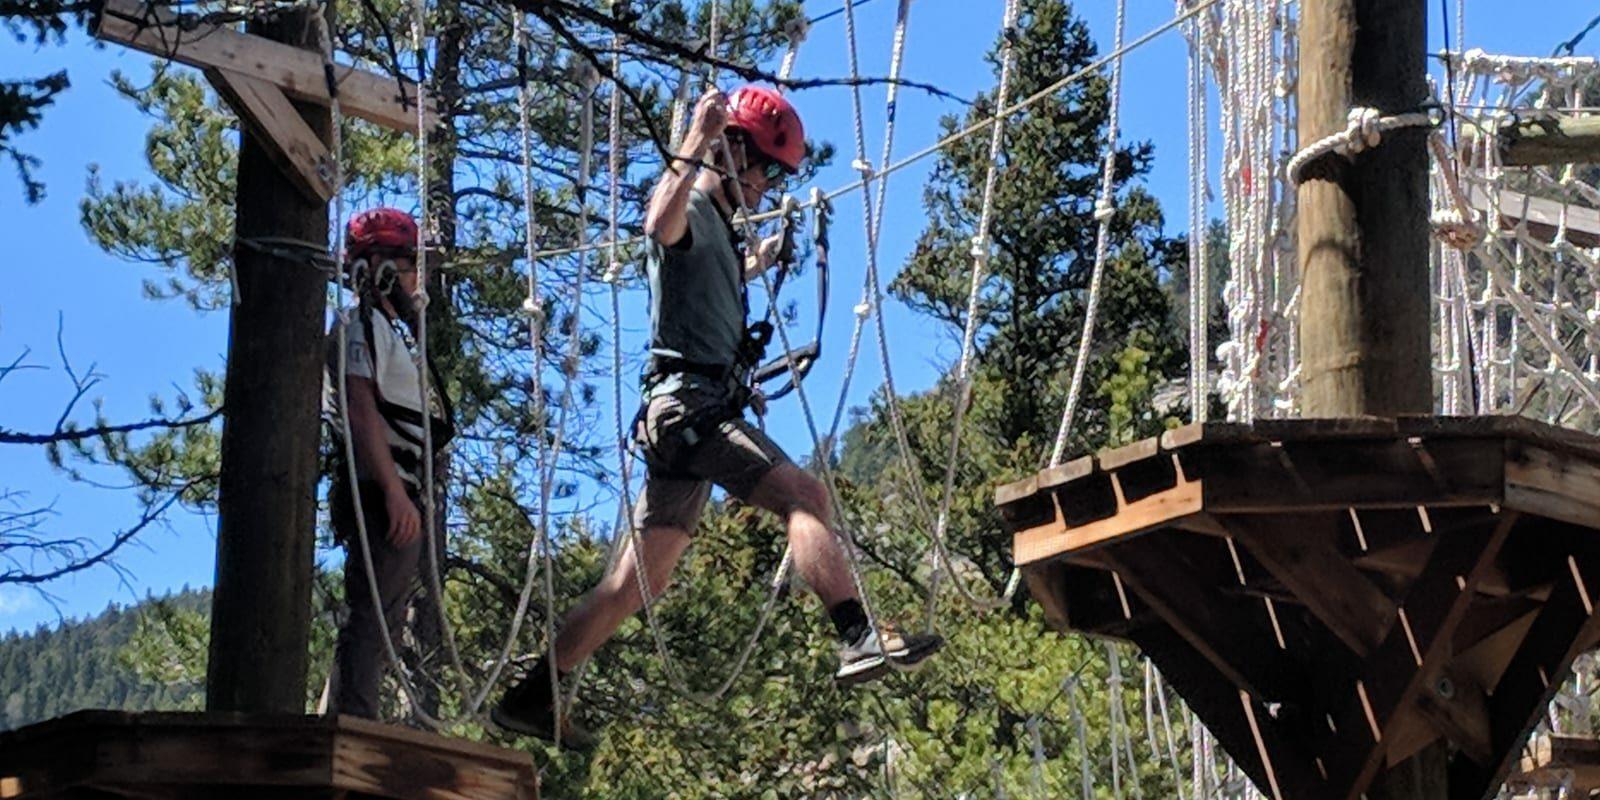 Lawson Adventure Park Resort Dumont Colorado